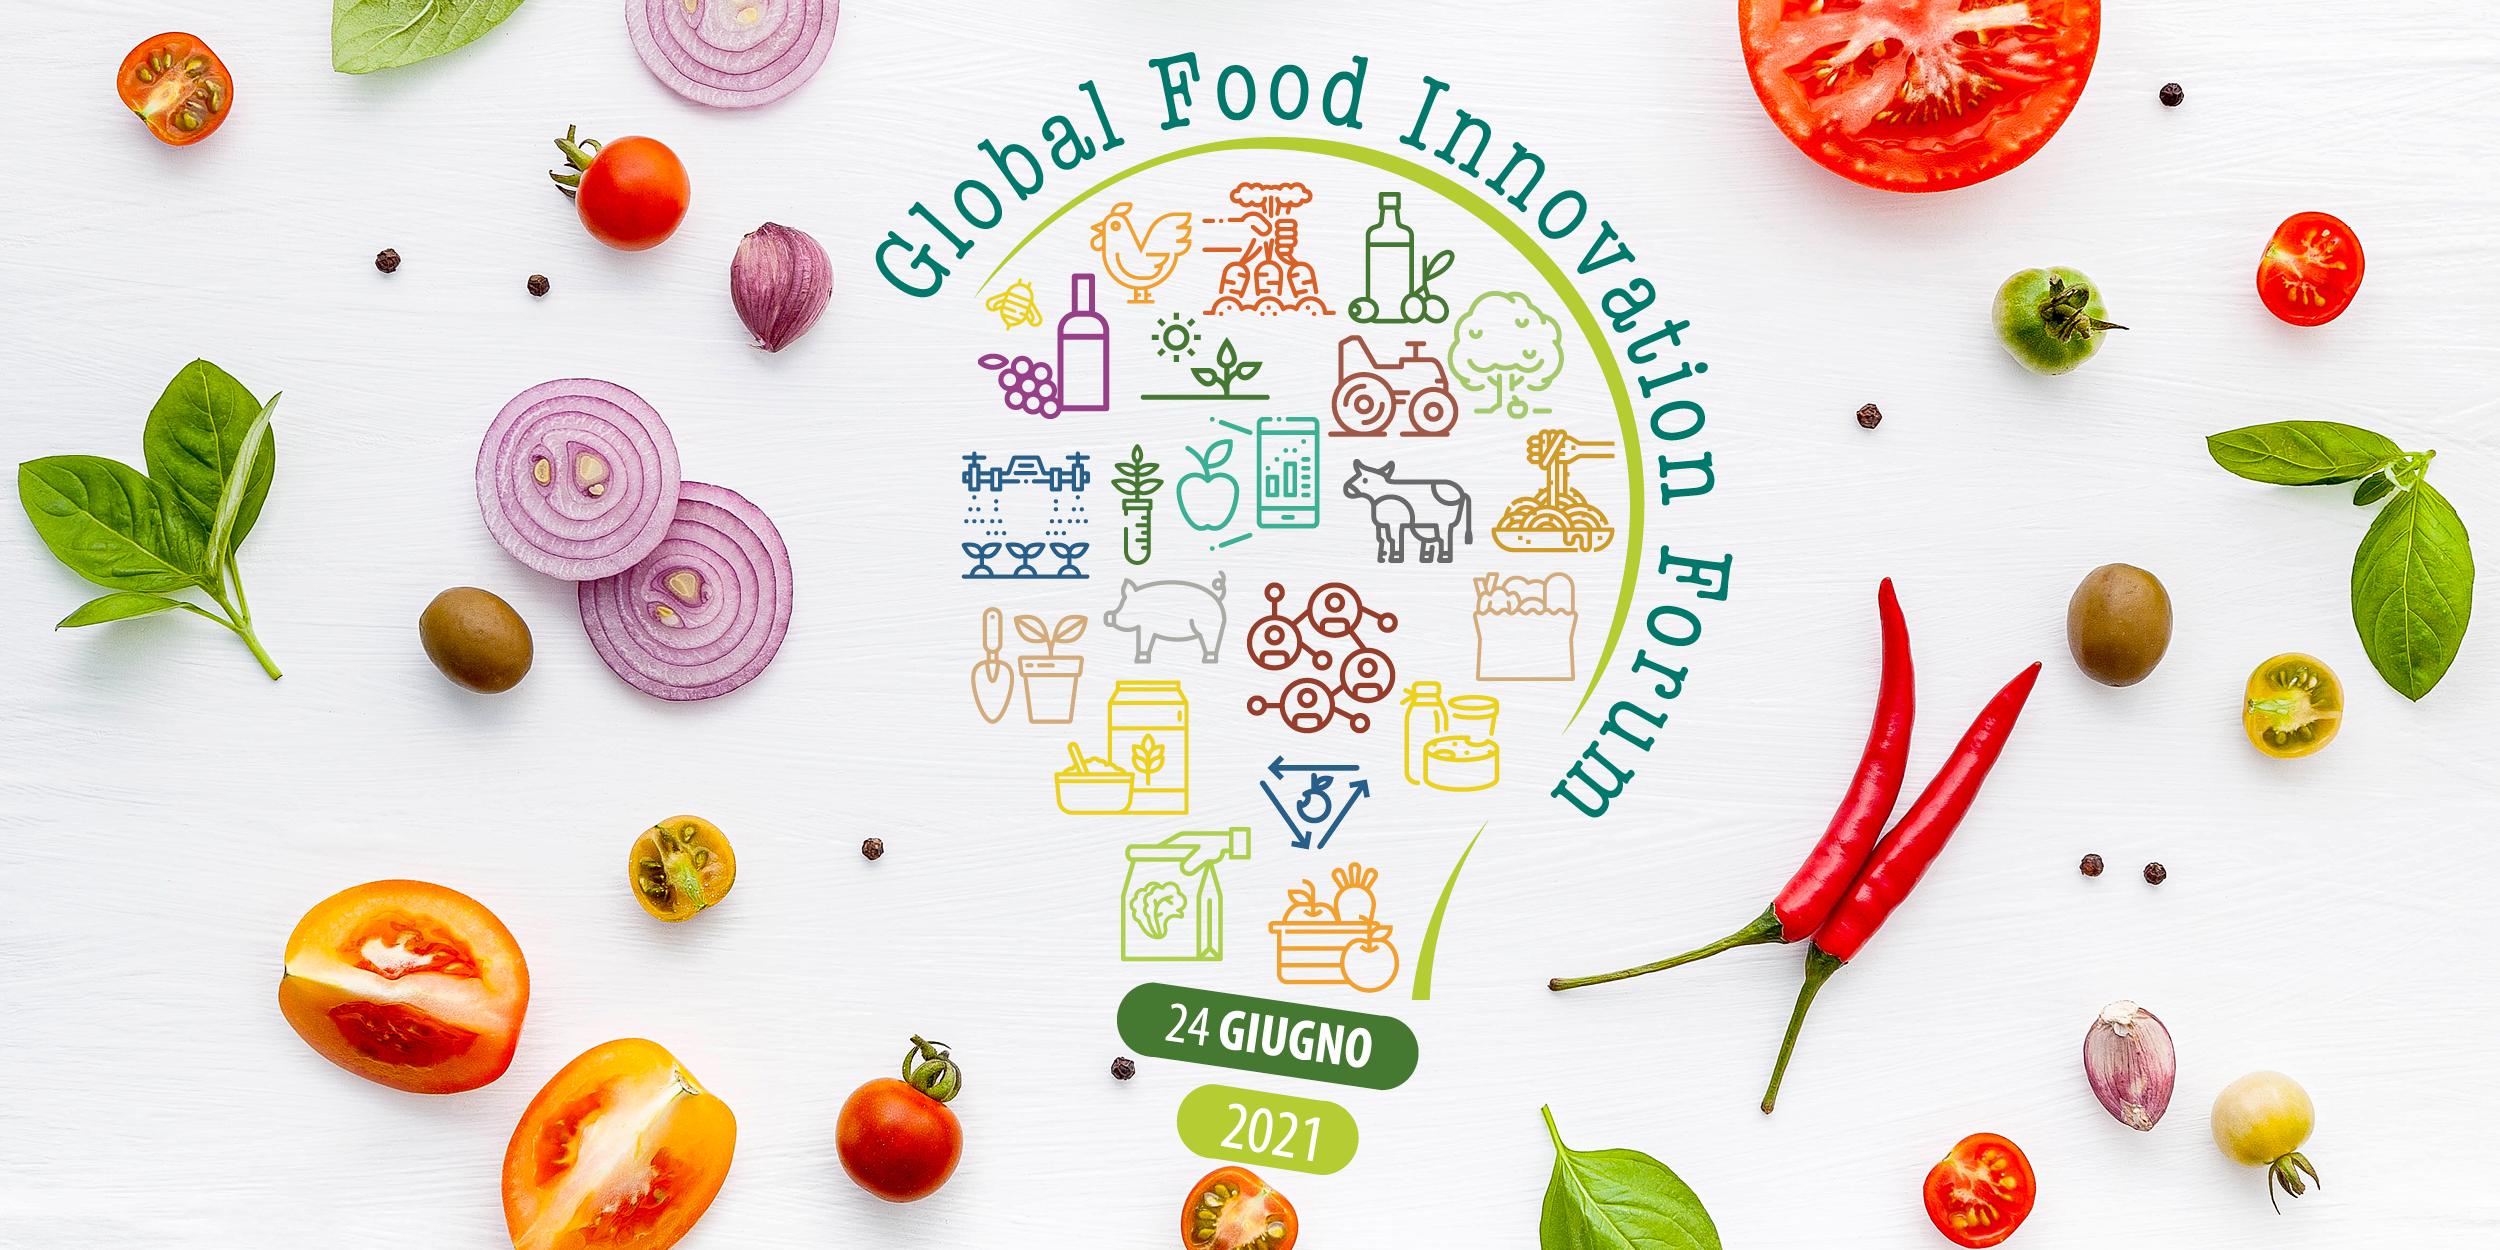 Global Food Innovation Forum GLOBAL FOOD INNOVATION FORUM, NASCE LA PRIMA COMUNITA' DI PRATICA AGRIFOOD